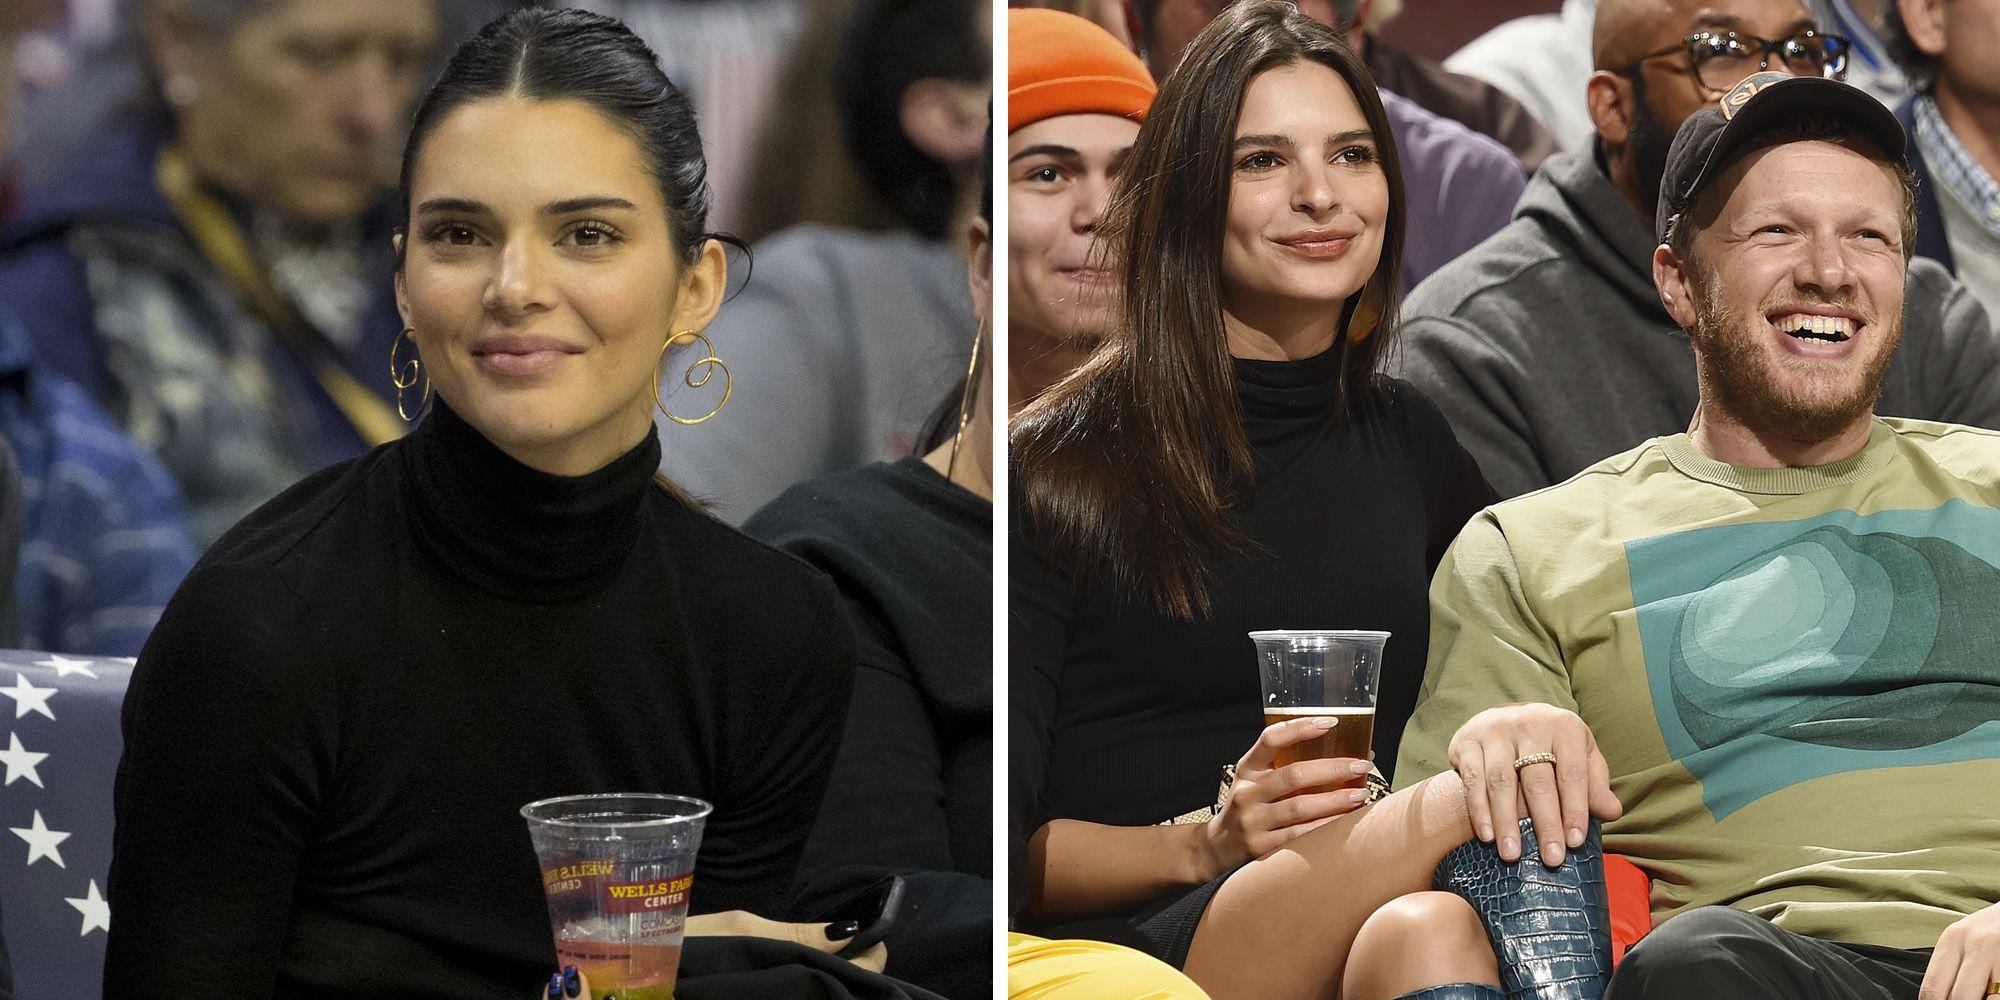 Kendall Jenner and Emily Ratajkowski Wear Matching Black